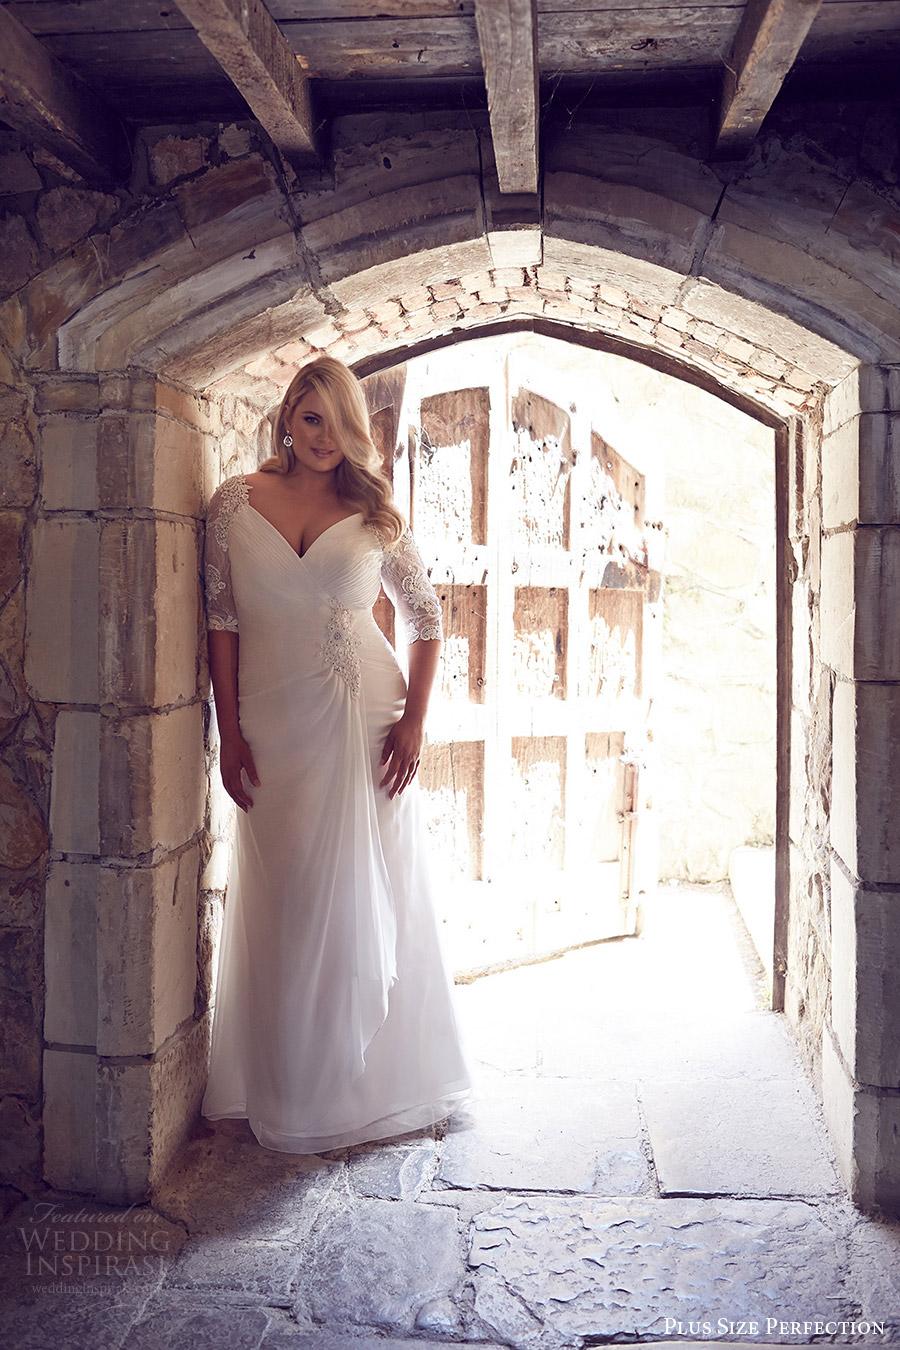 plus size perfection bridal 2016 illusion 3 quarter sleeves vneck draped skirt ruched bodice a line wedding dress (odessa) mv romantic elegant